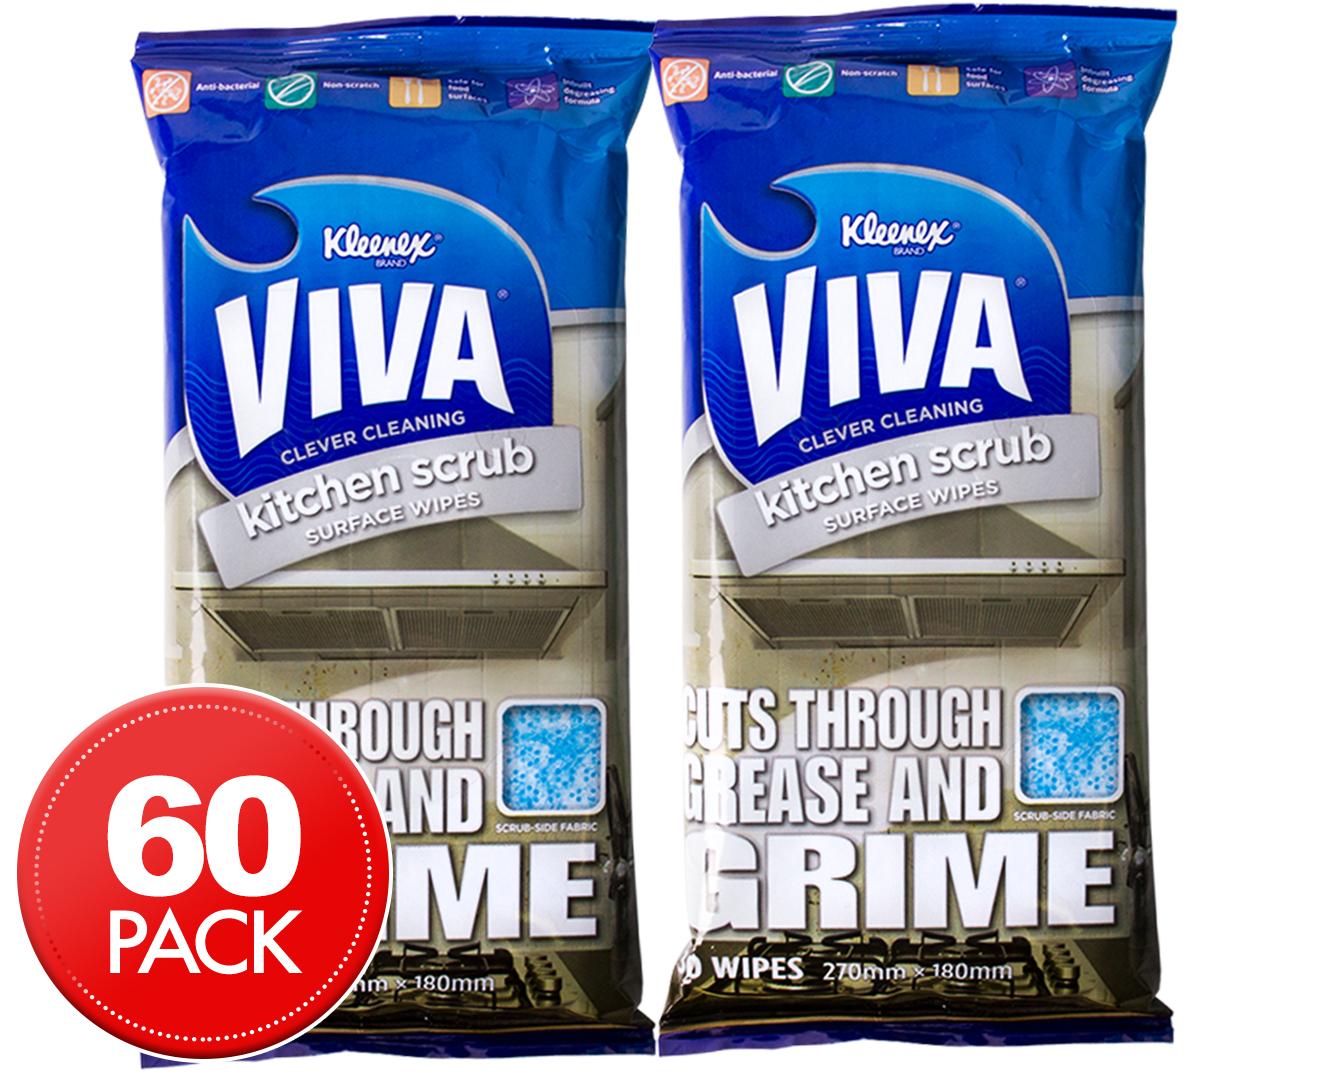 2 X Kleenex VIVA Kitchen Scrub Wipes 30pk